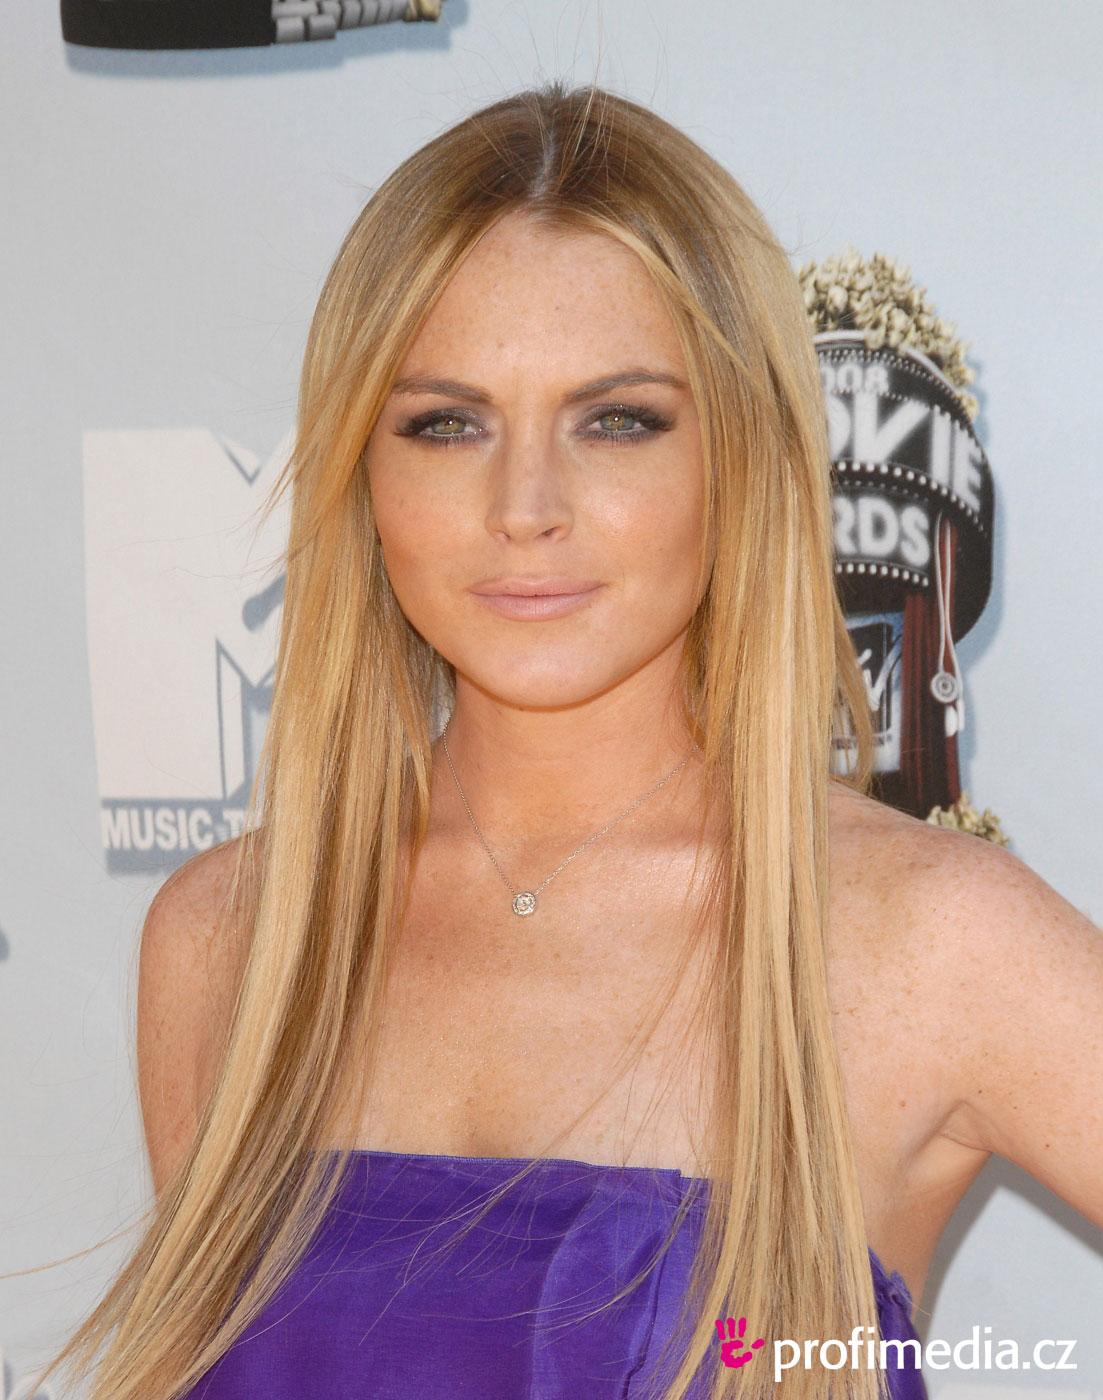 Lindsay Lohan Hairstyle Easyhairstyler